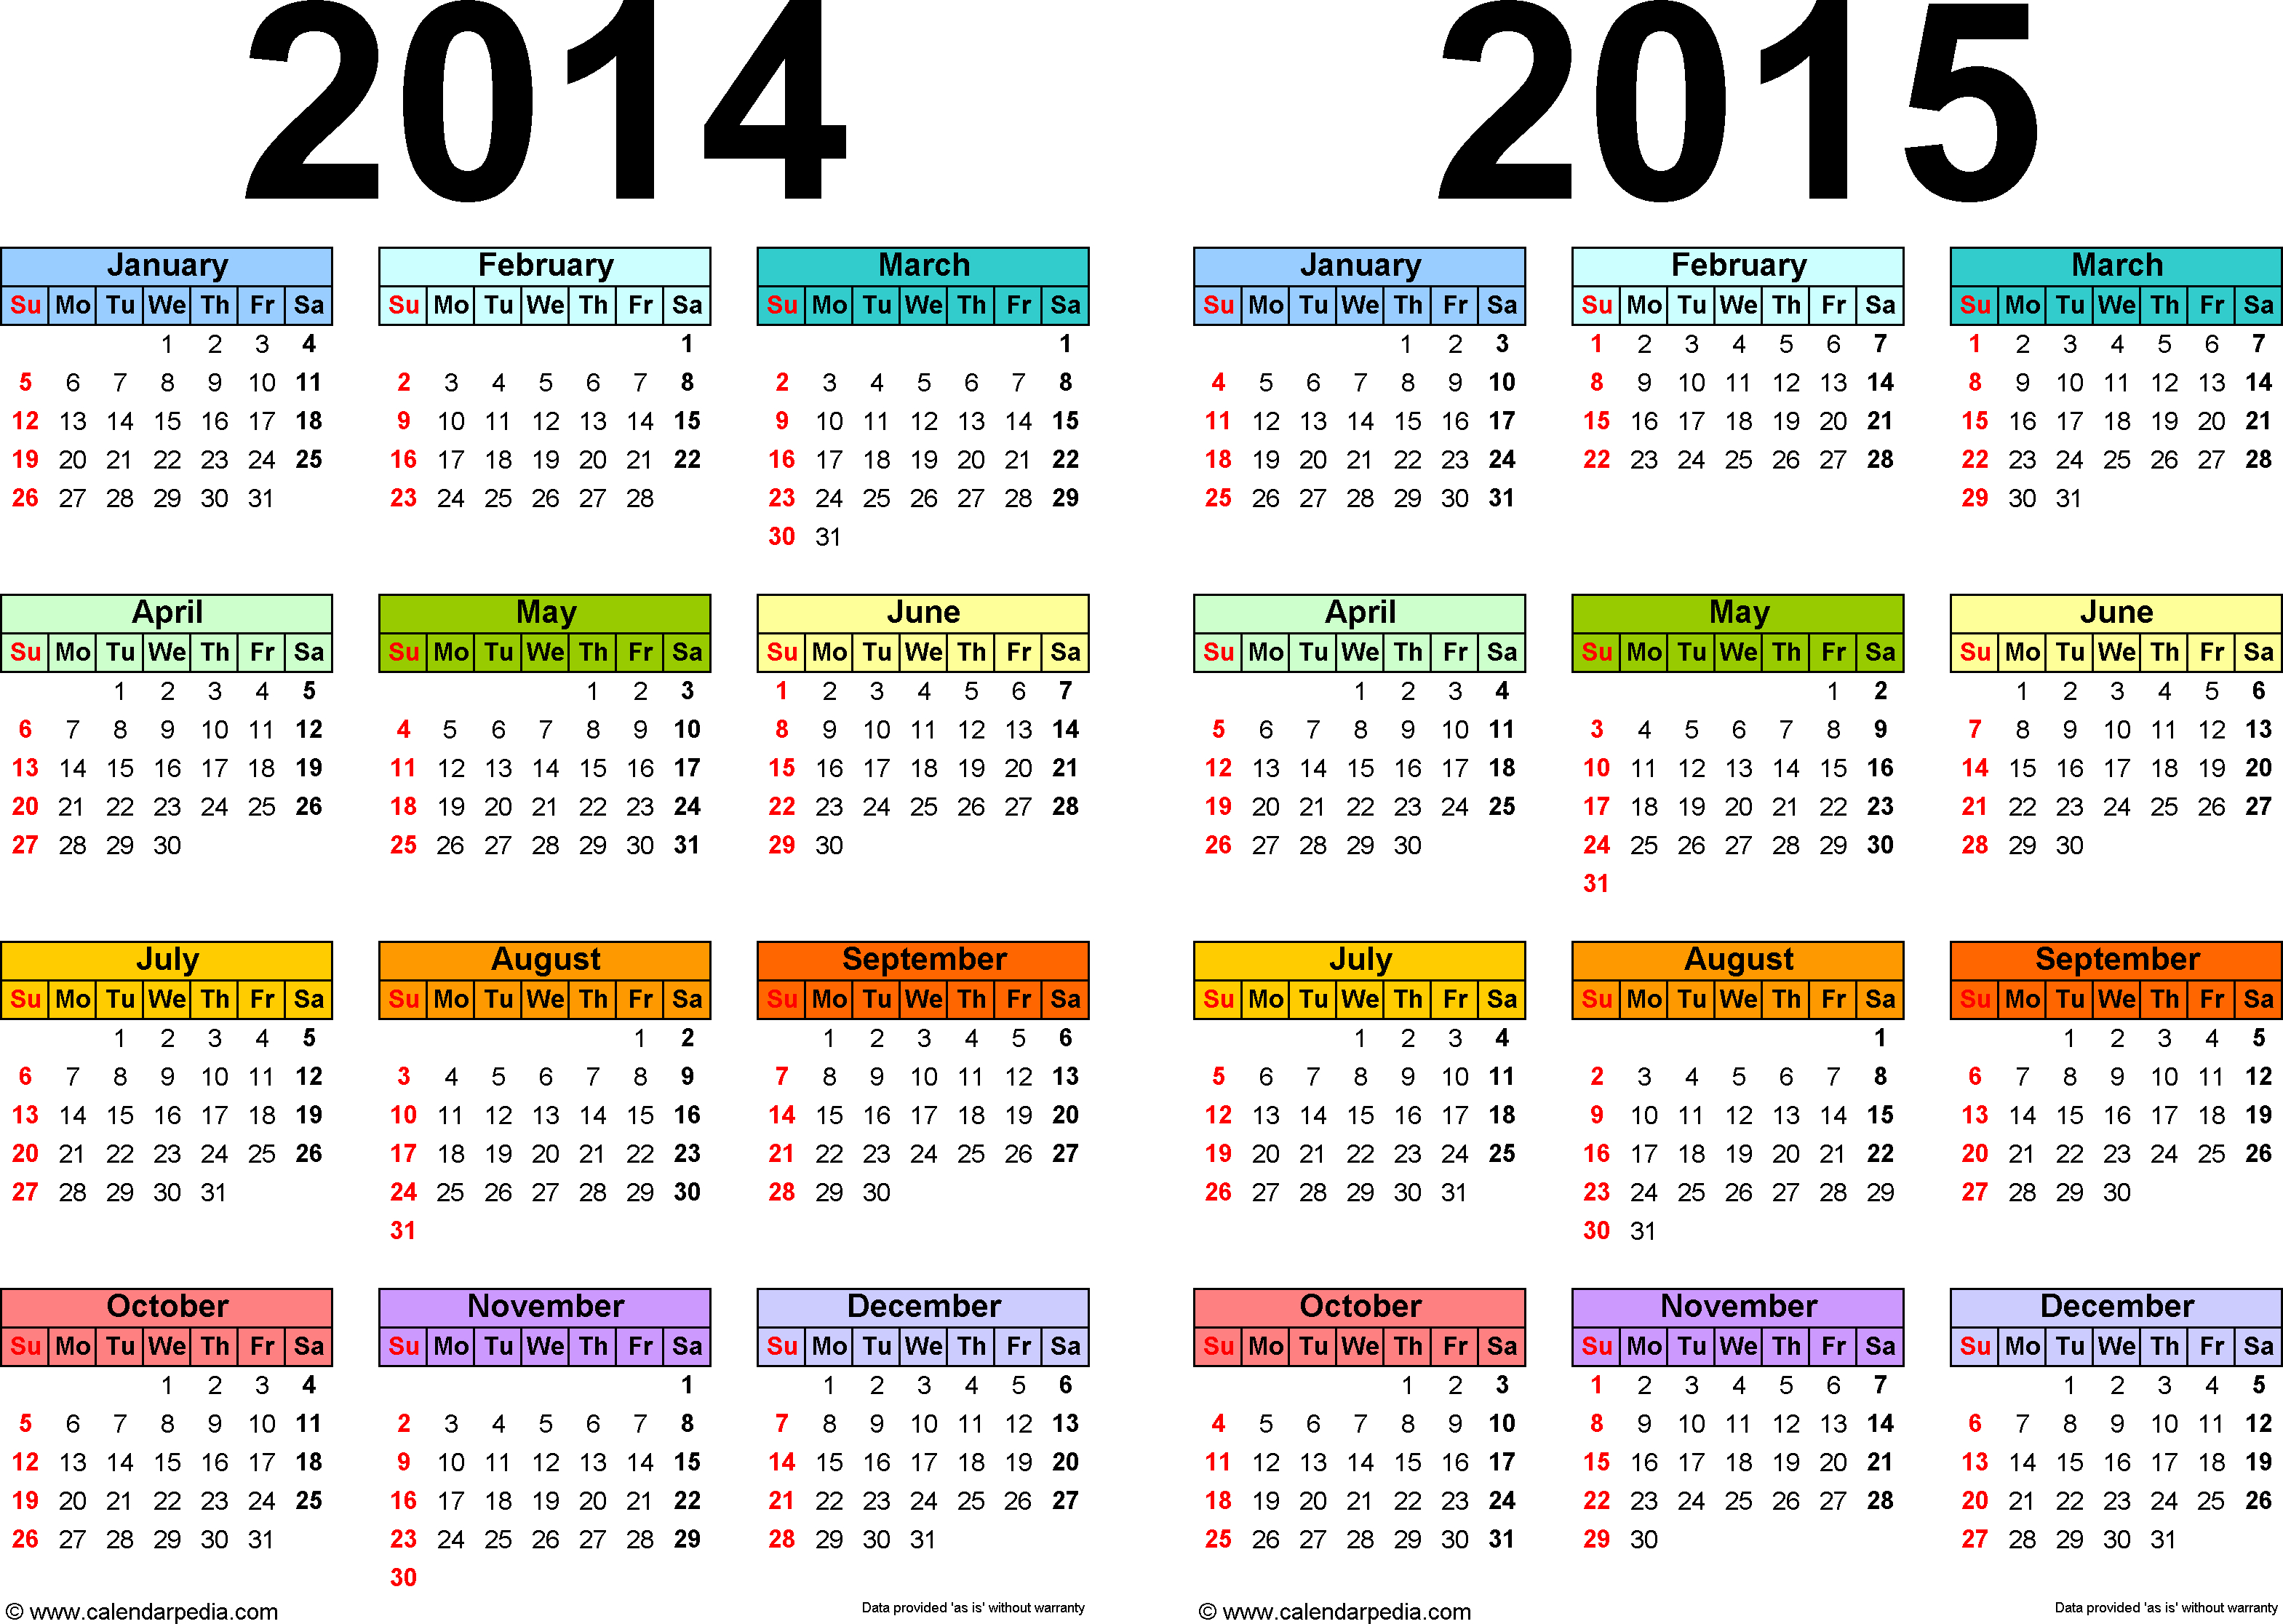 2014-2015 Calendar - Free Printable Two-Year Pdf Calendars - Free Printable Diary 2015